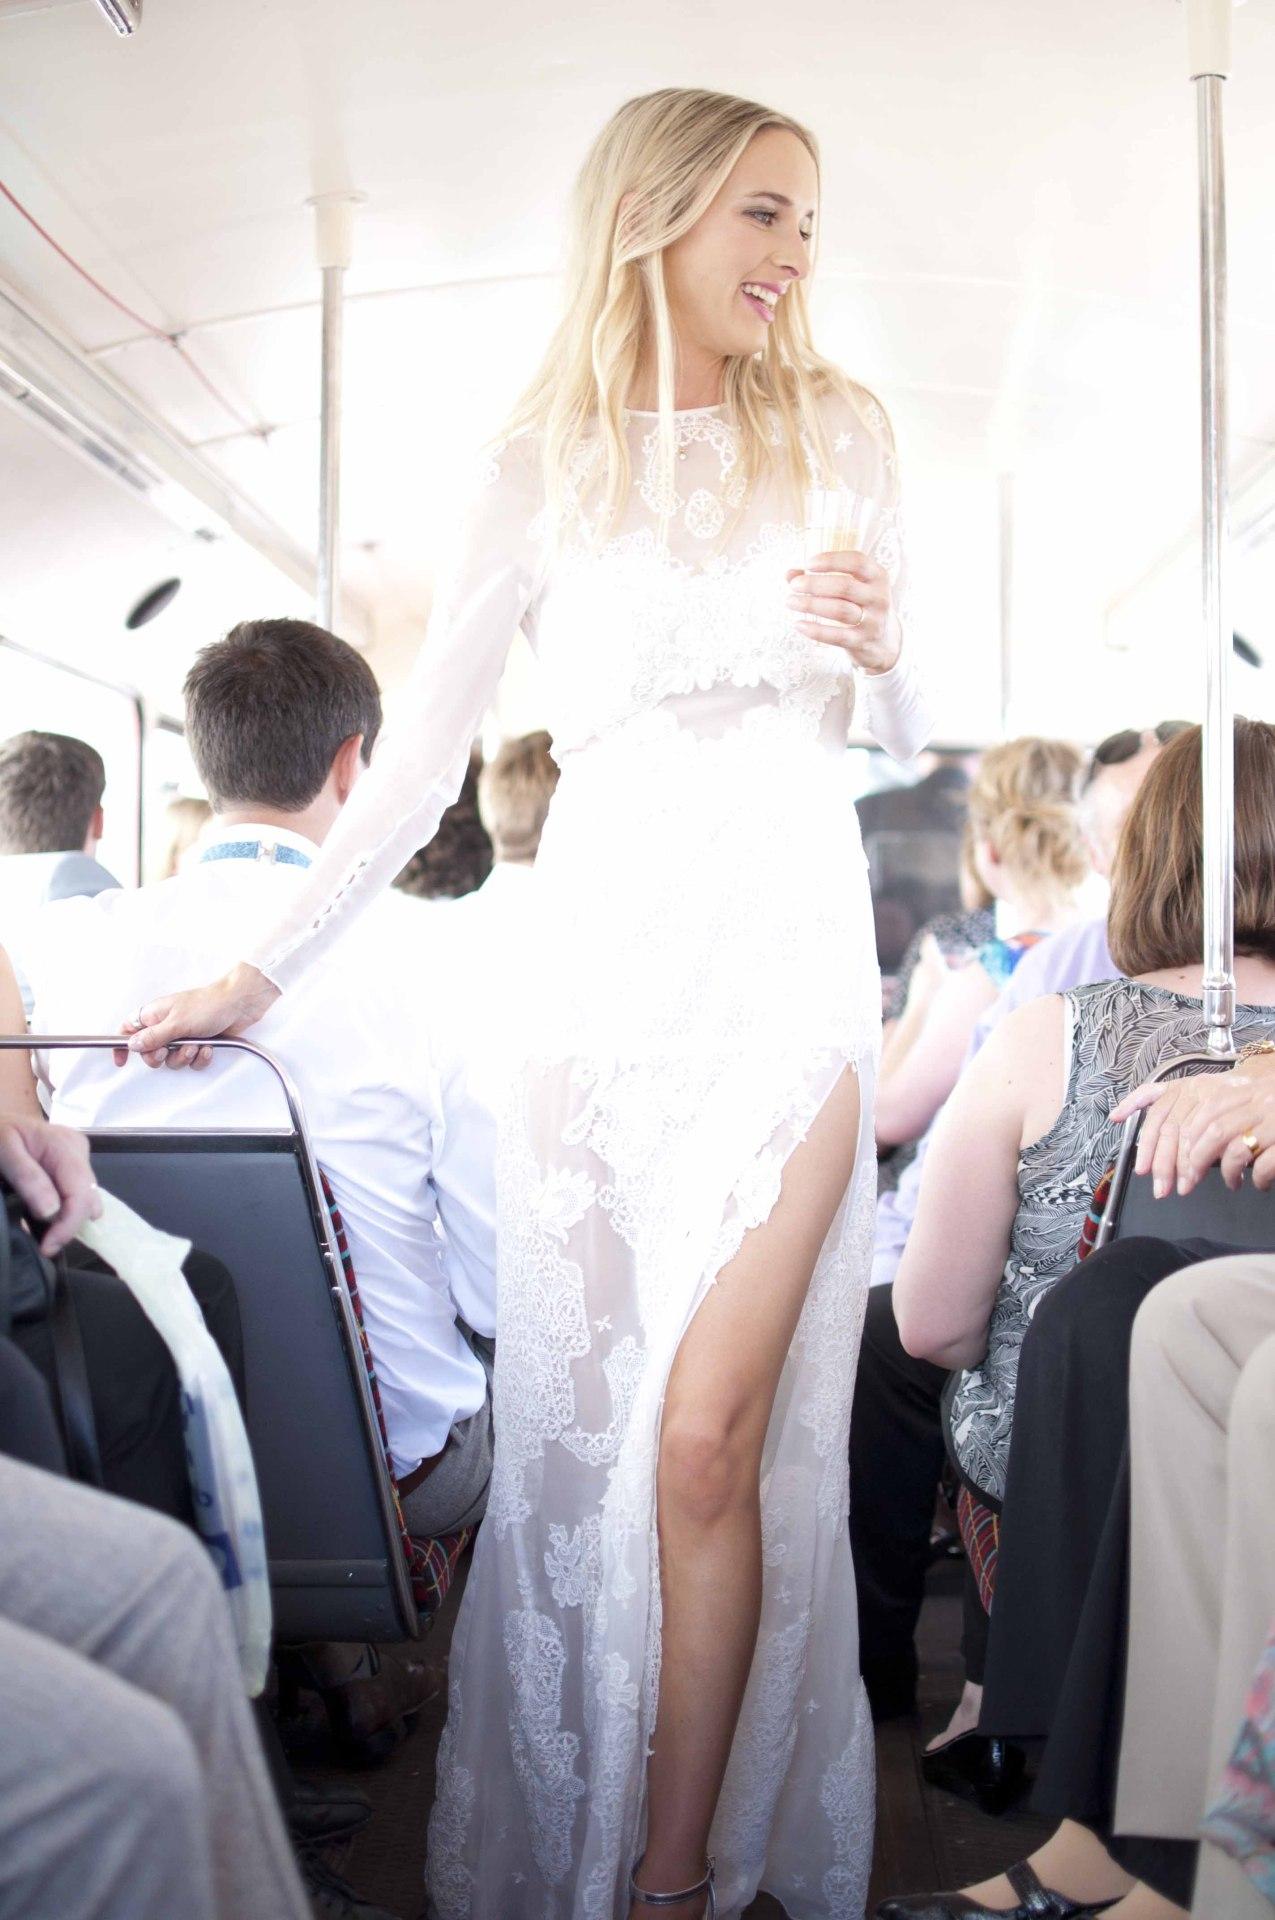 sheer geometric lace wedding dress thigh split